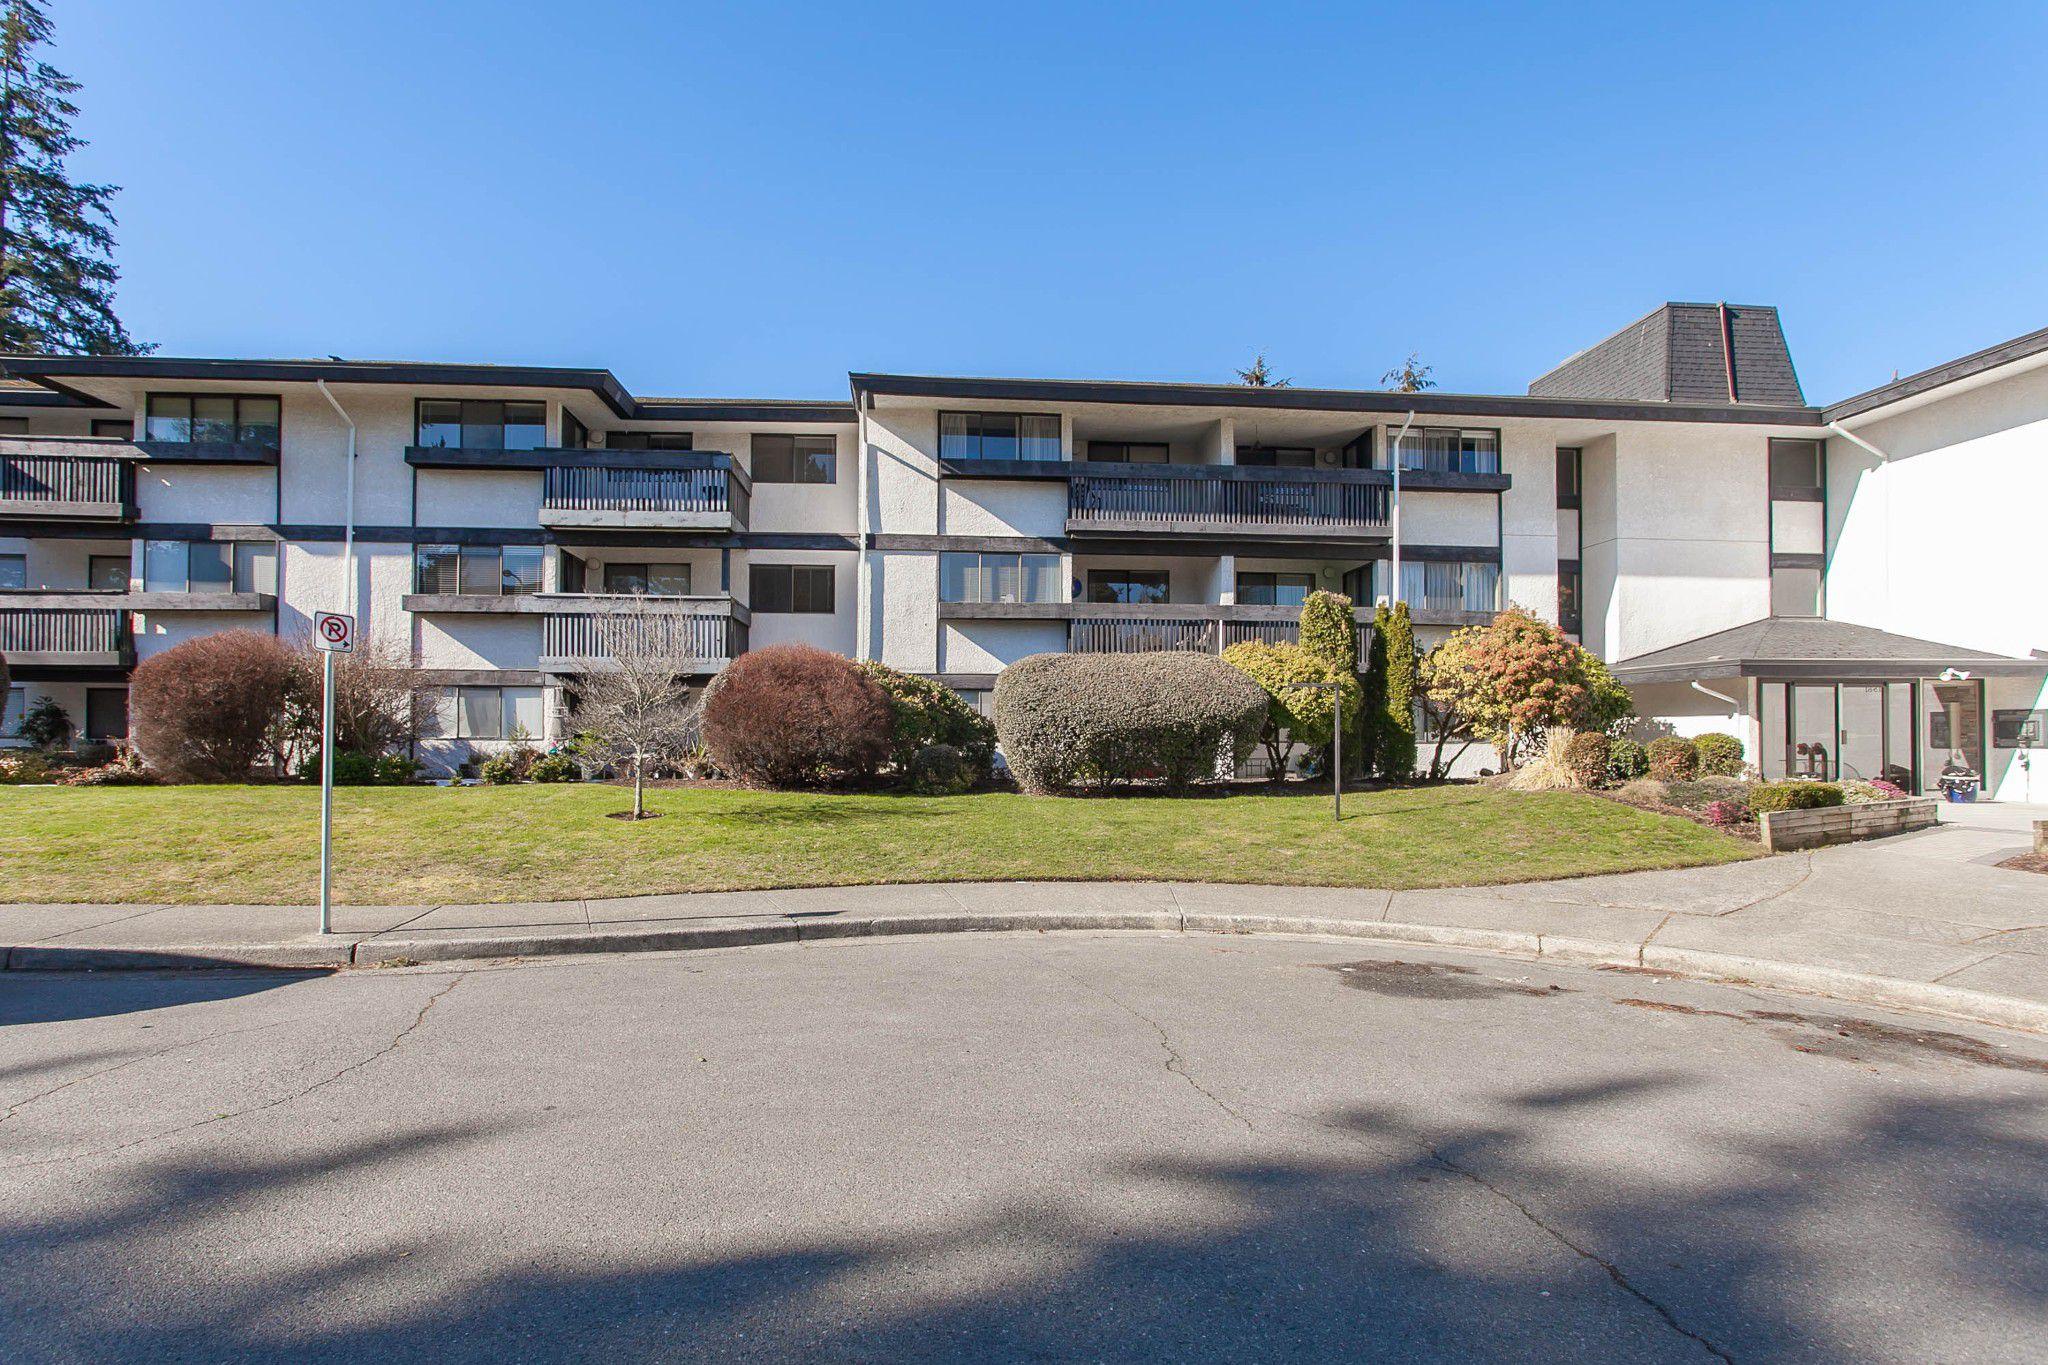 "Main Photo: 212 1561 VIDAL Street: White Rock Condo for sale in ""RIDGECREST"" (South Surrey White Rock)  : MLS®# R2344716"